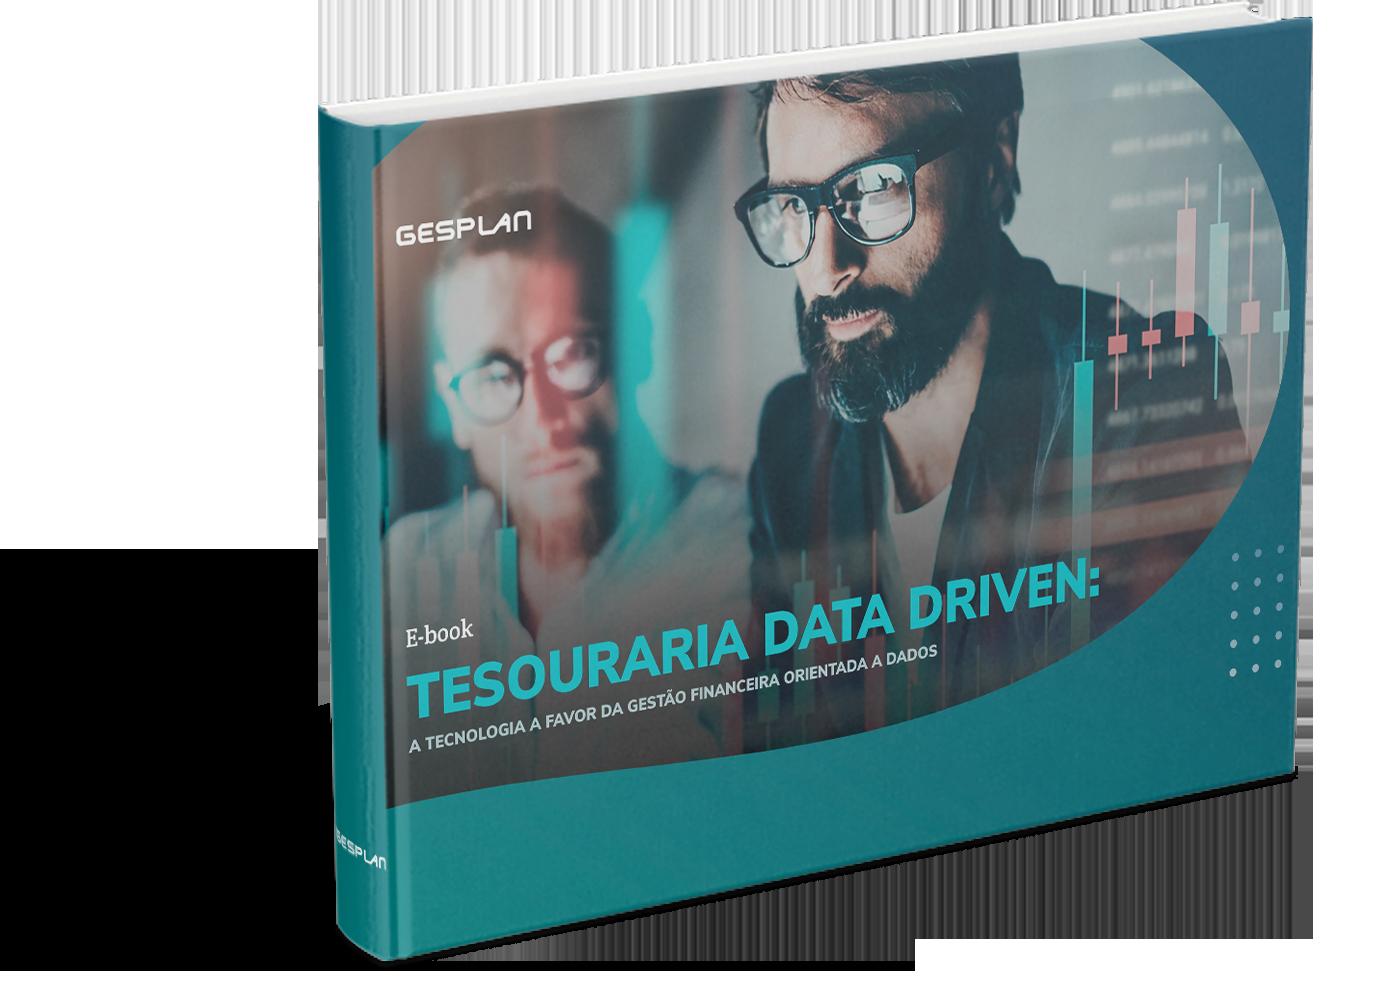 gesplan-ebook-guia-data-driven-1